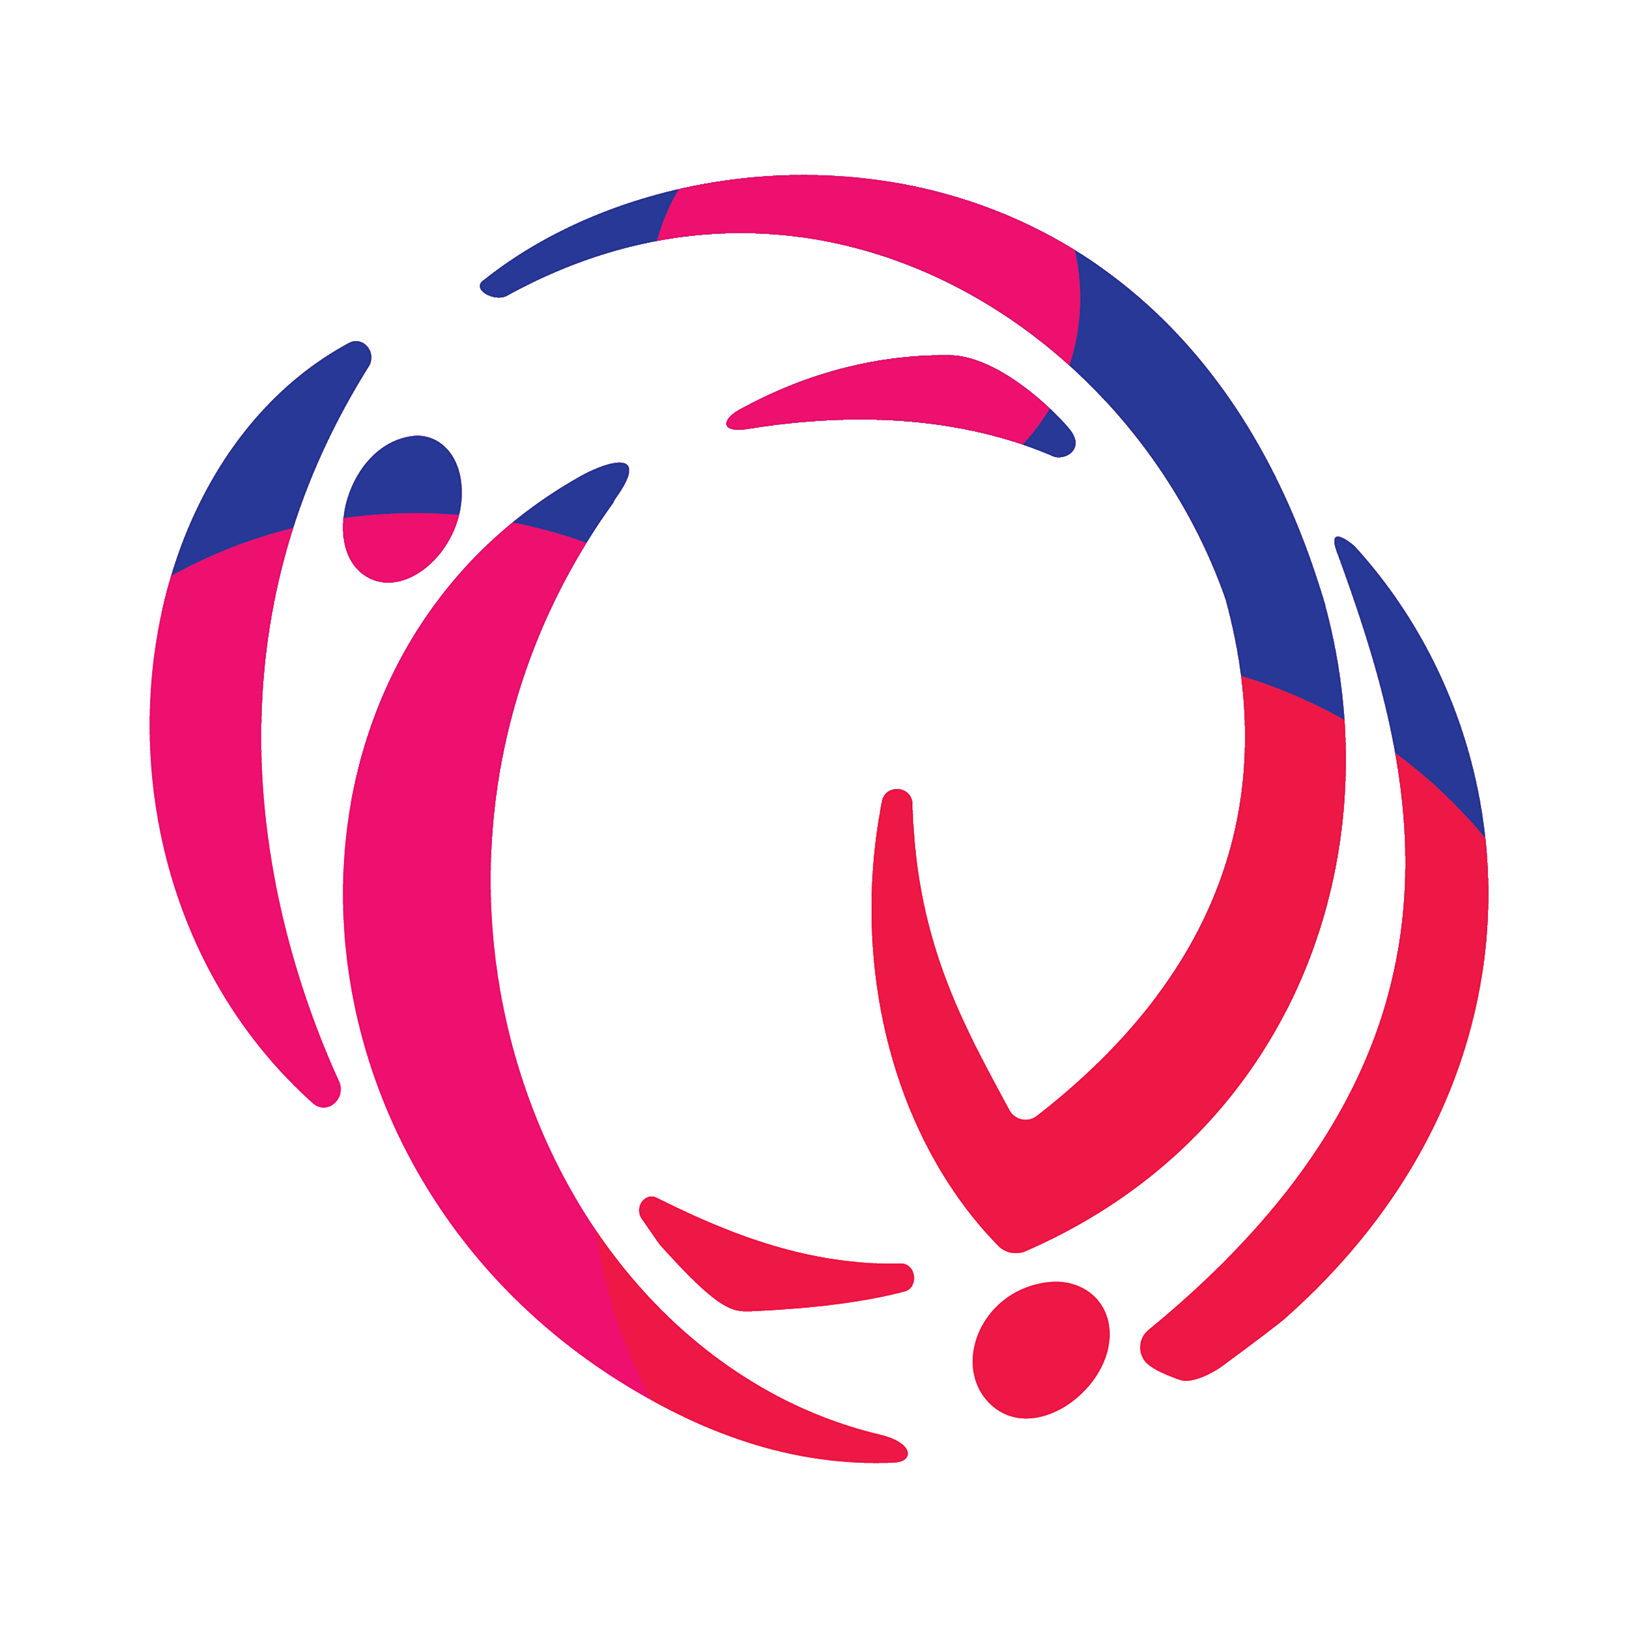 2012 European Artistic Gymnastics Championships - Women